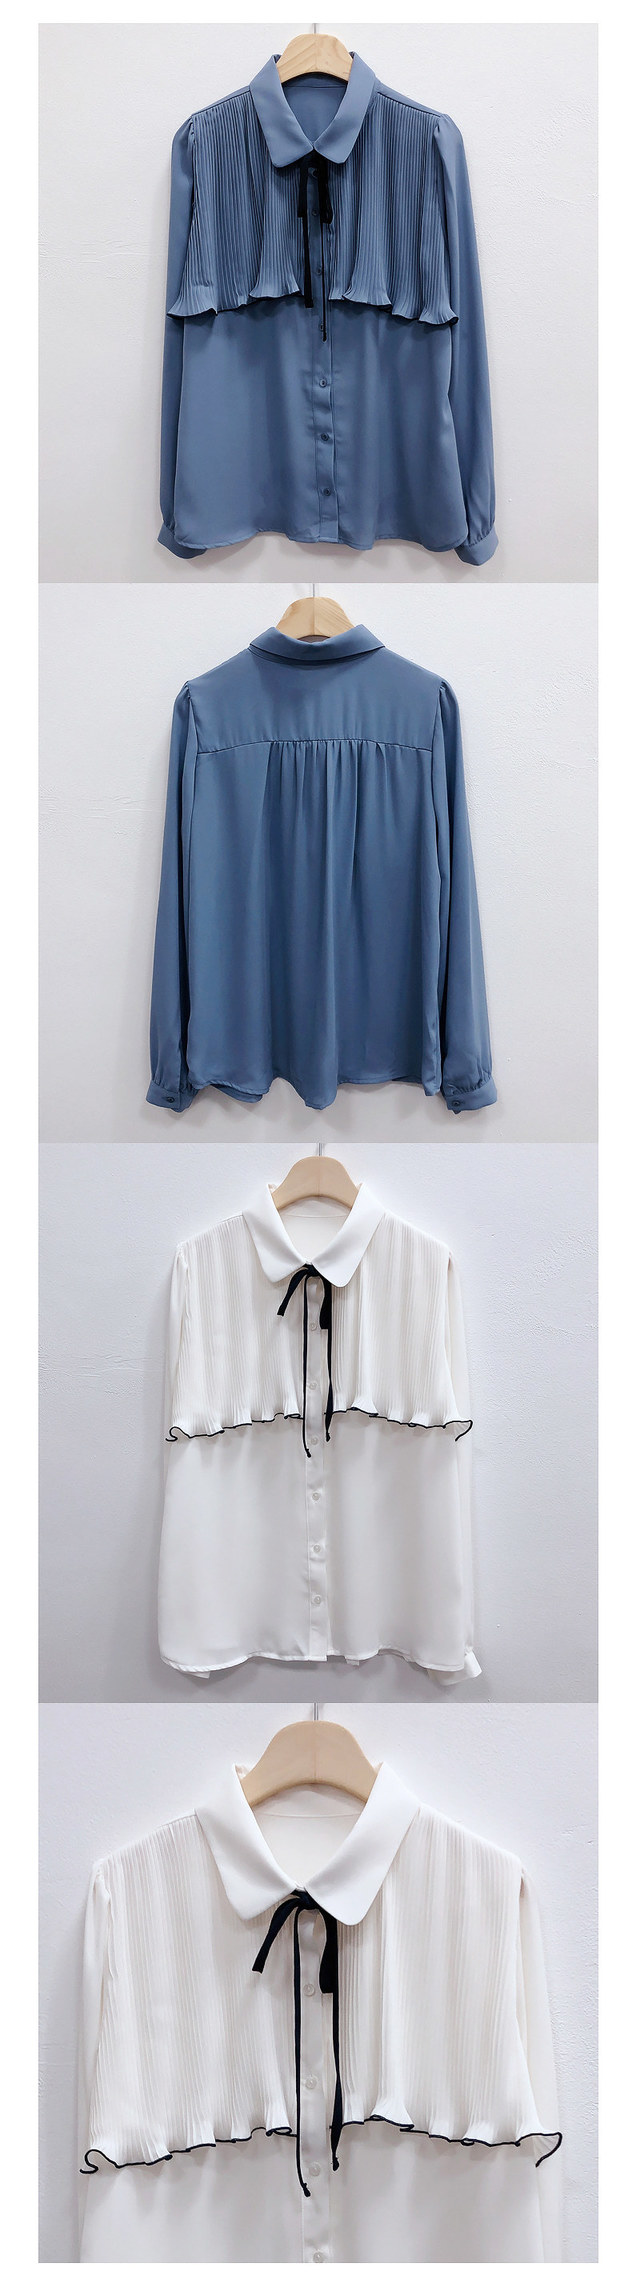 Mood frill ruffle ribbon blouse